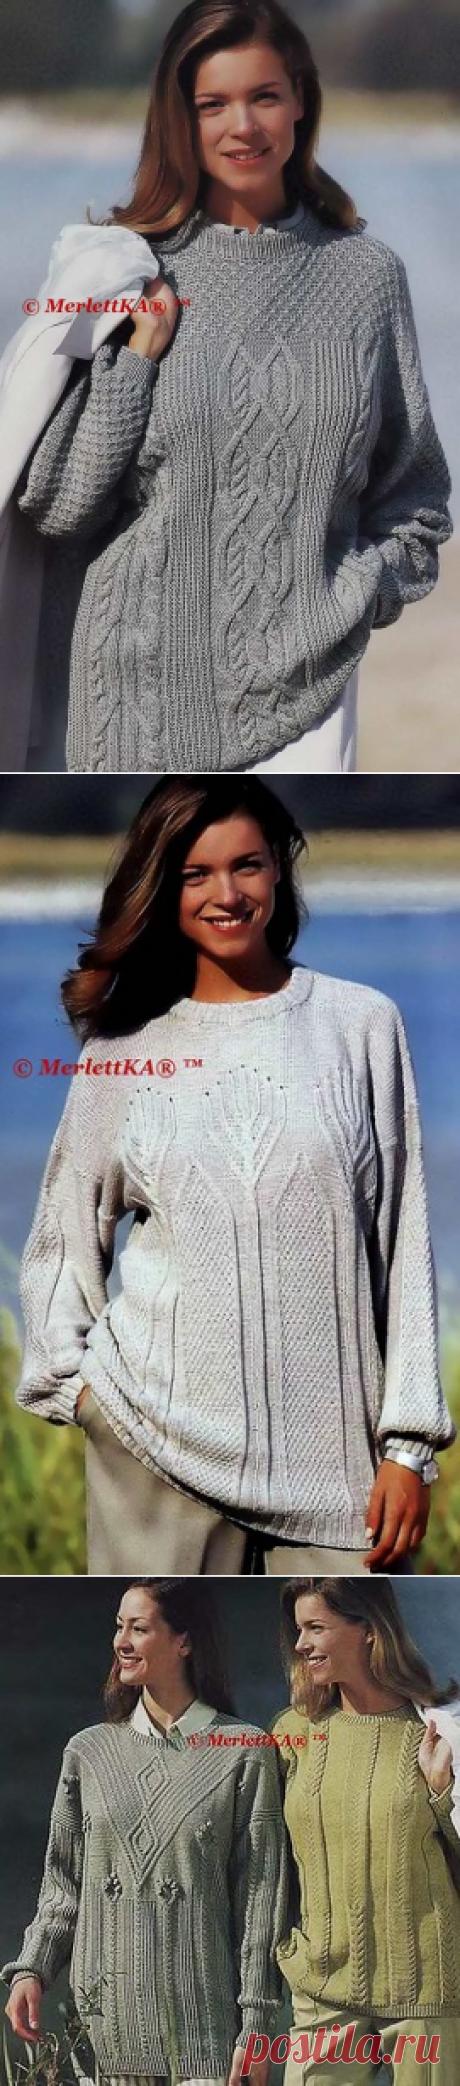 Pullovers oversayz or Lempsheyding ✿ knitting by spokes